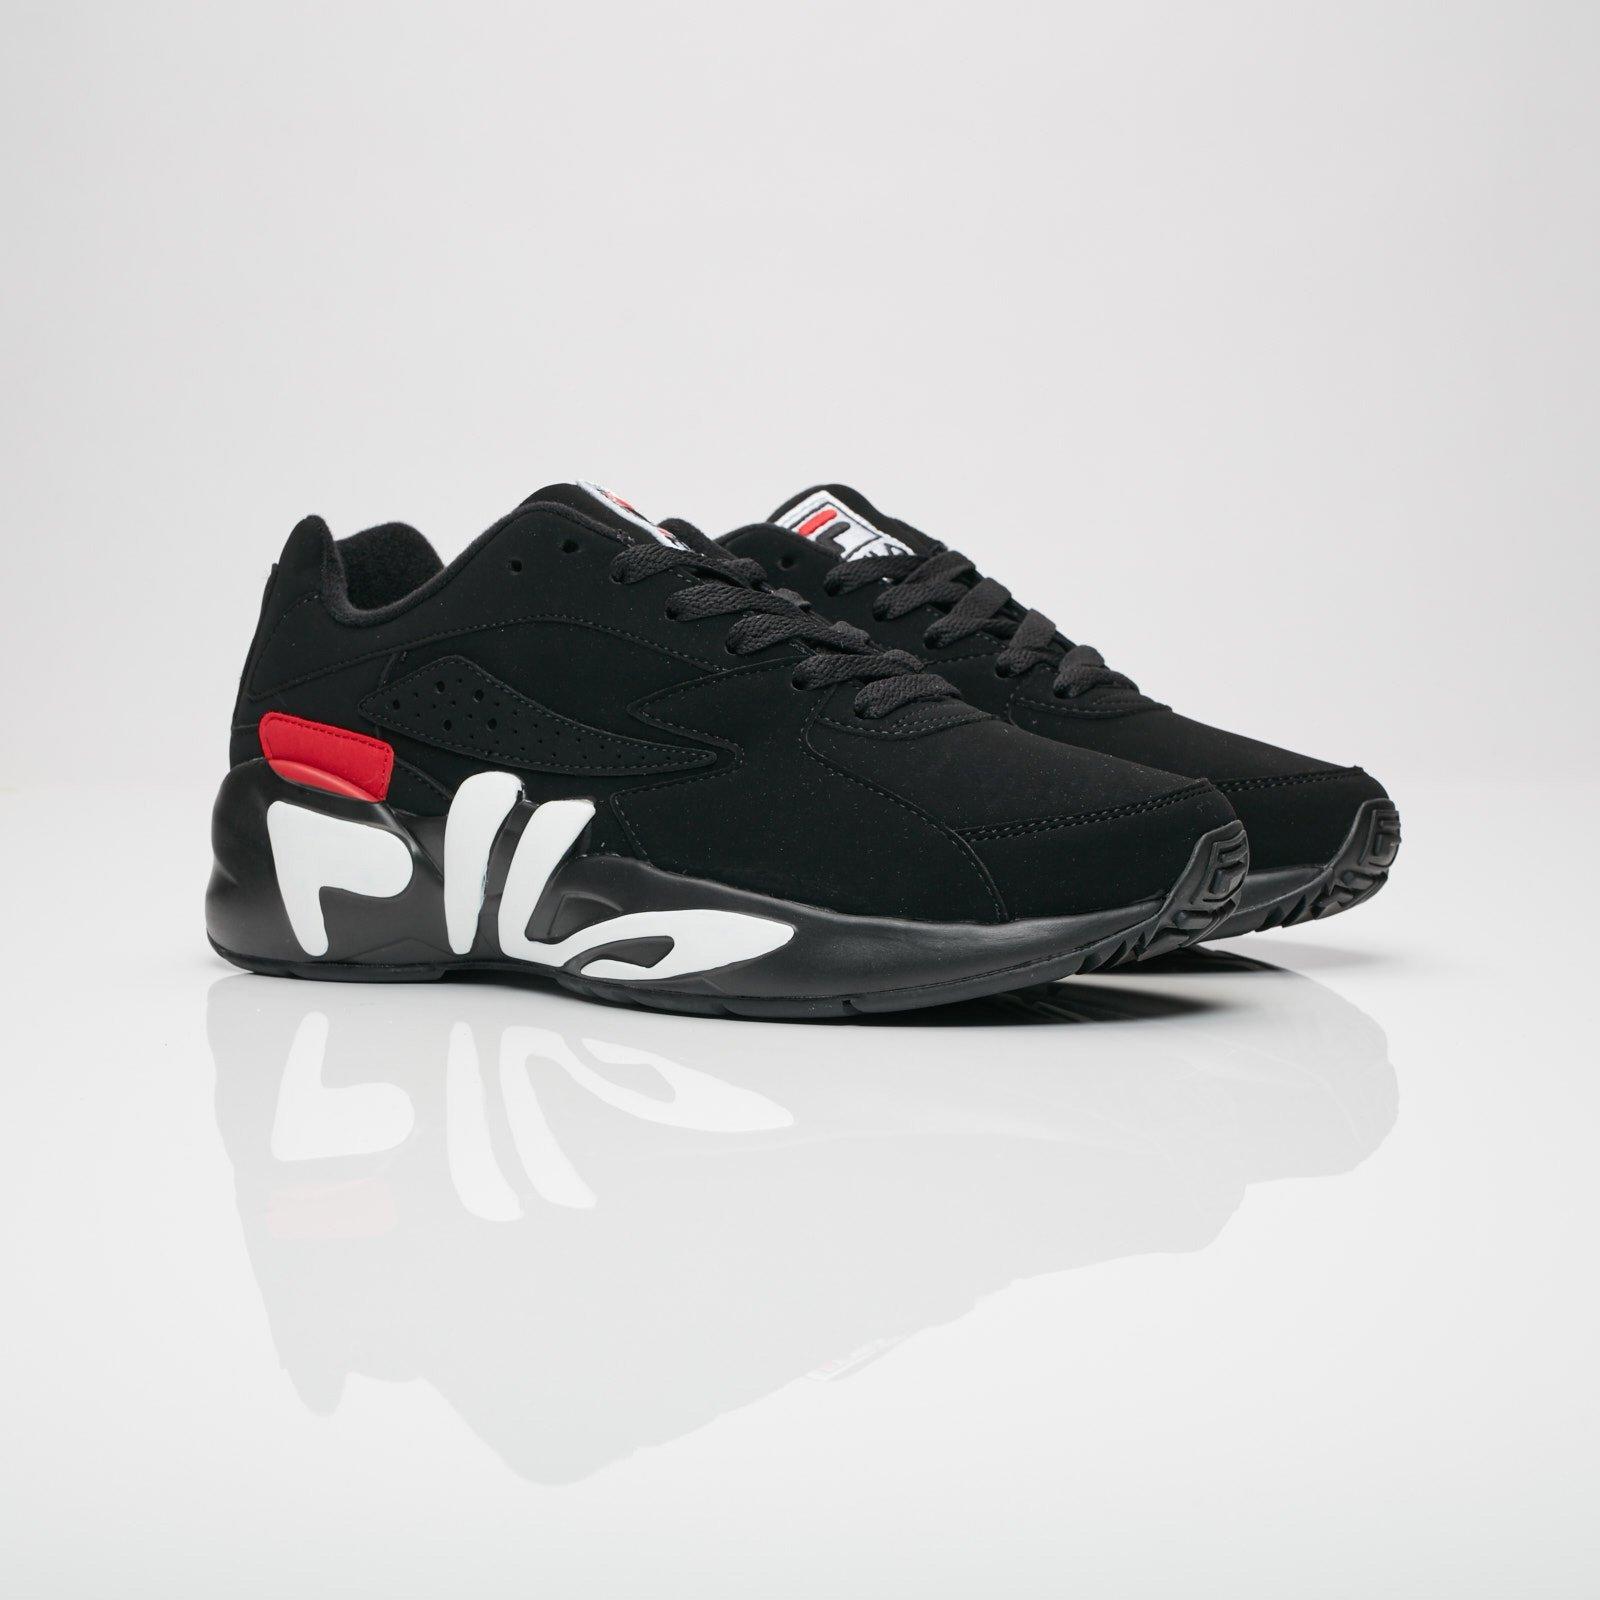 Fila Mindblower - 1rm00201-014 - Sneakersnstuff I Sneakers ...